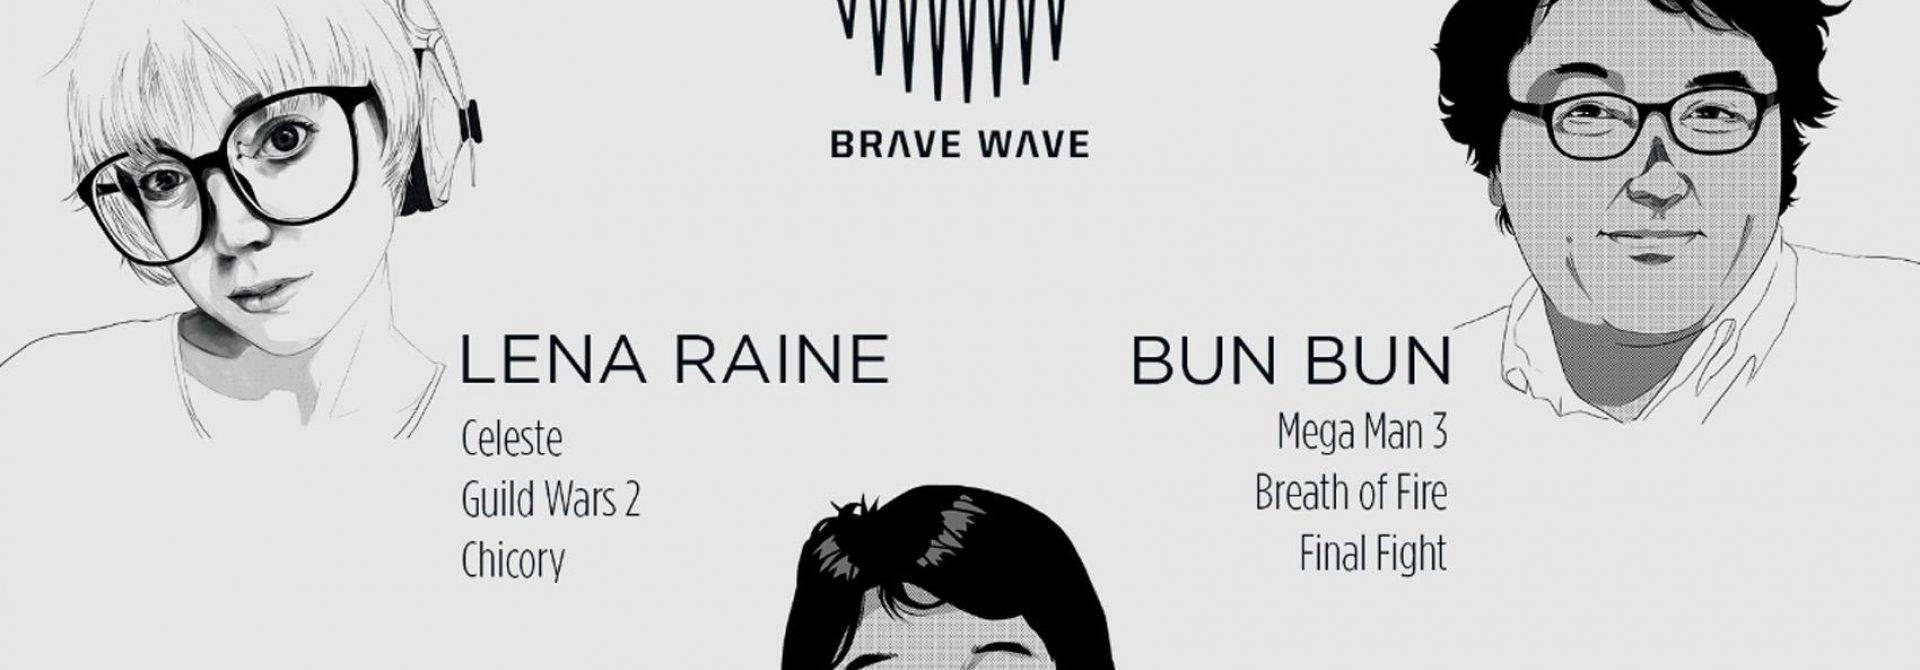 Celeste, Mega Man 3, Sonic Mania Composers Join Brave Wave Music Label